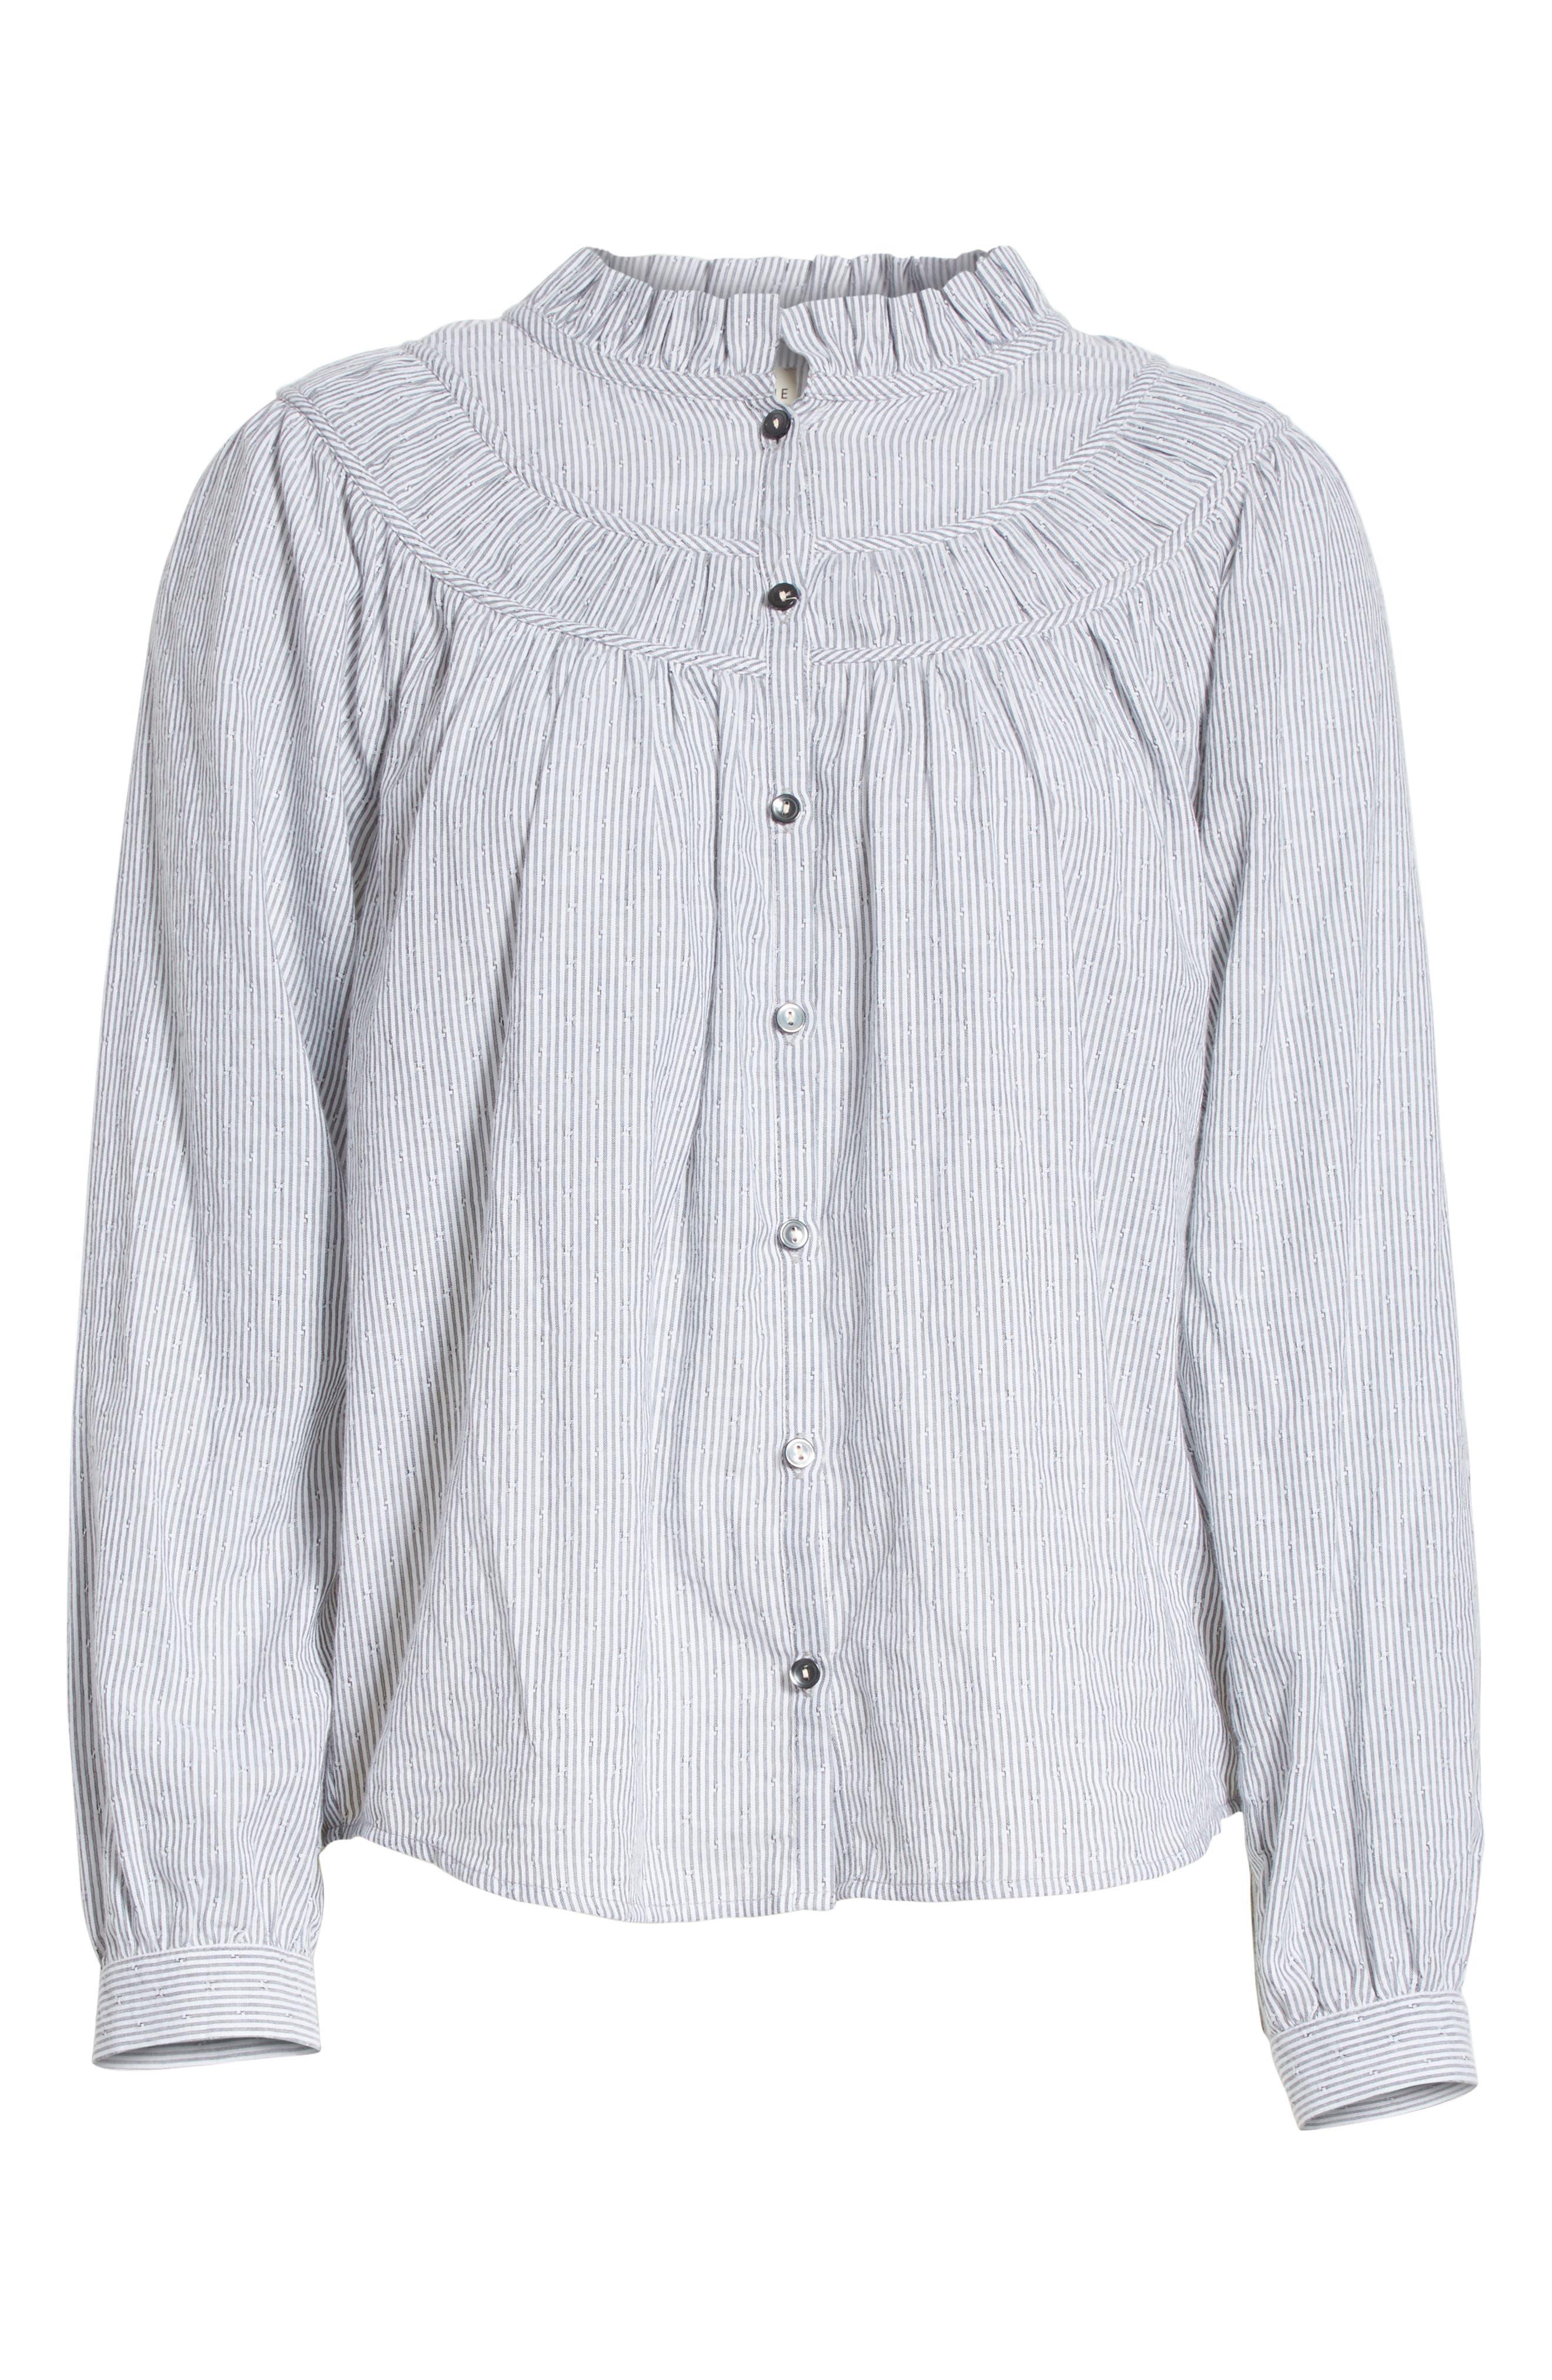 Stripe Long Sleeve Ruffle Shirt,                             Alternate thumbnail 6, color,                             Washed Black Combo